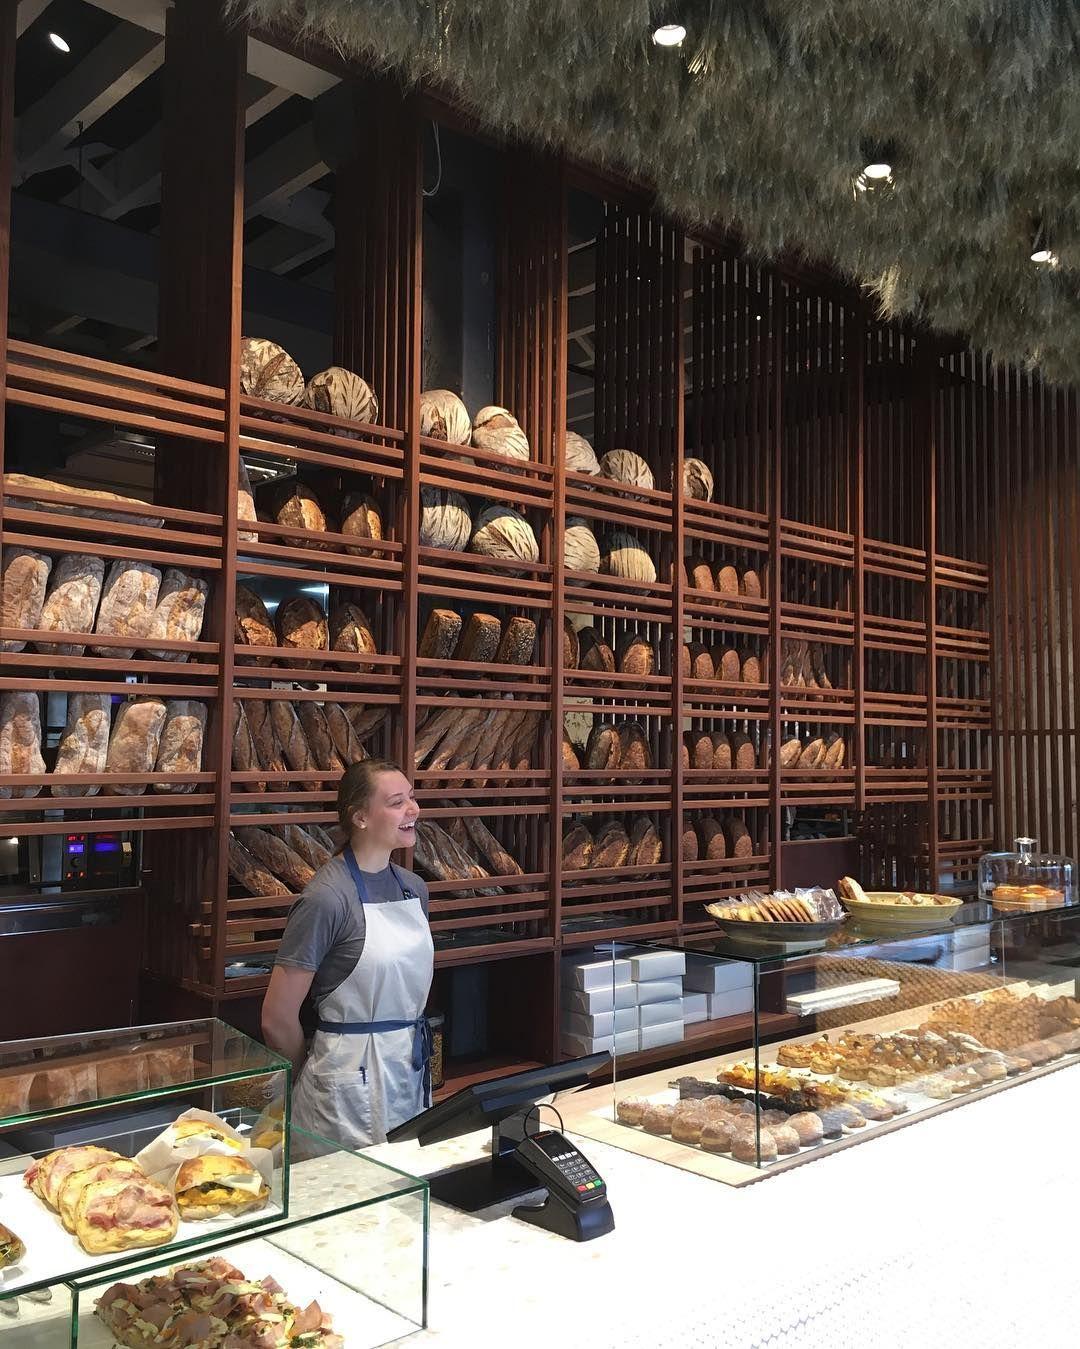 Amano Bakery New Zealand Great Bread Shelves And Counter Bread Shop Bakery Design Interior Bakery Design